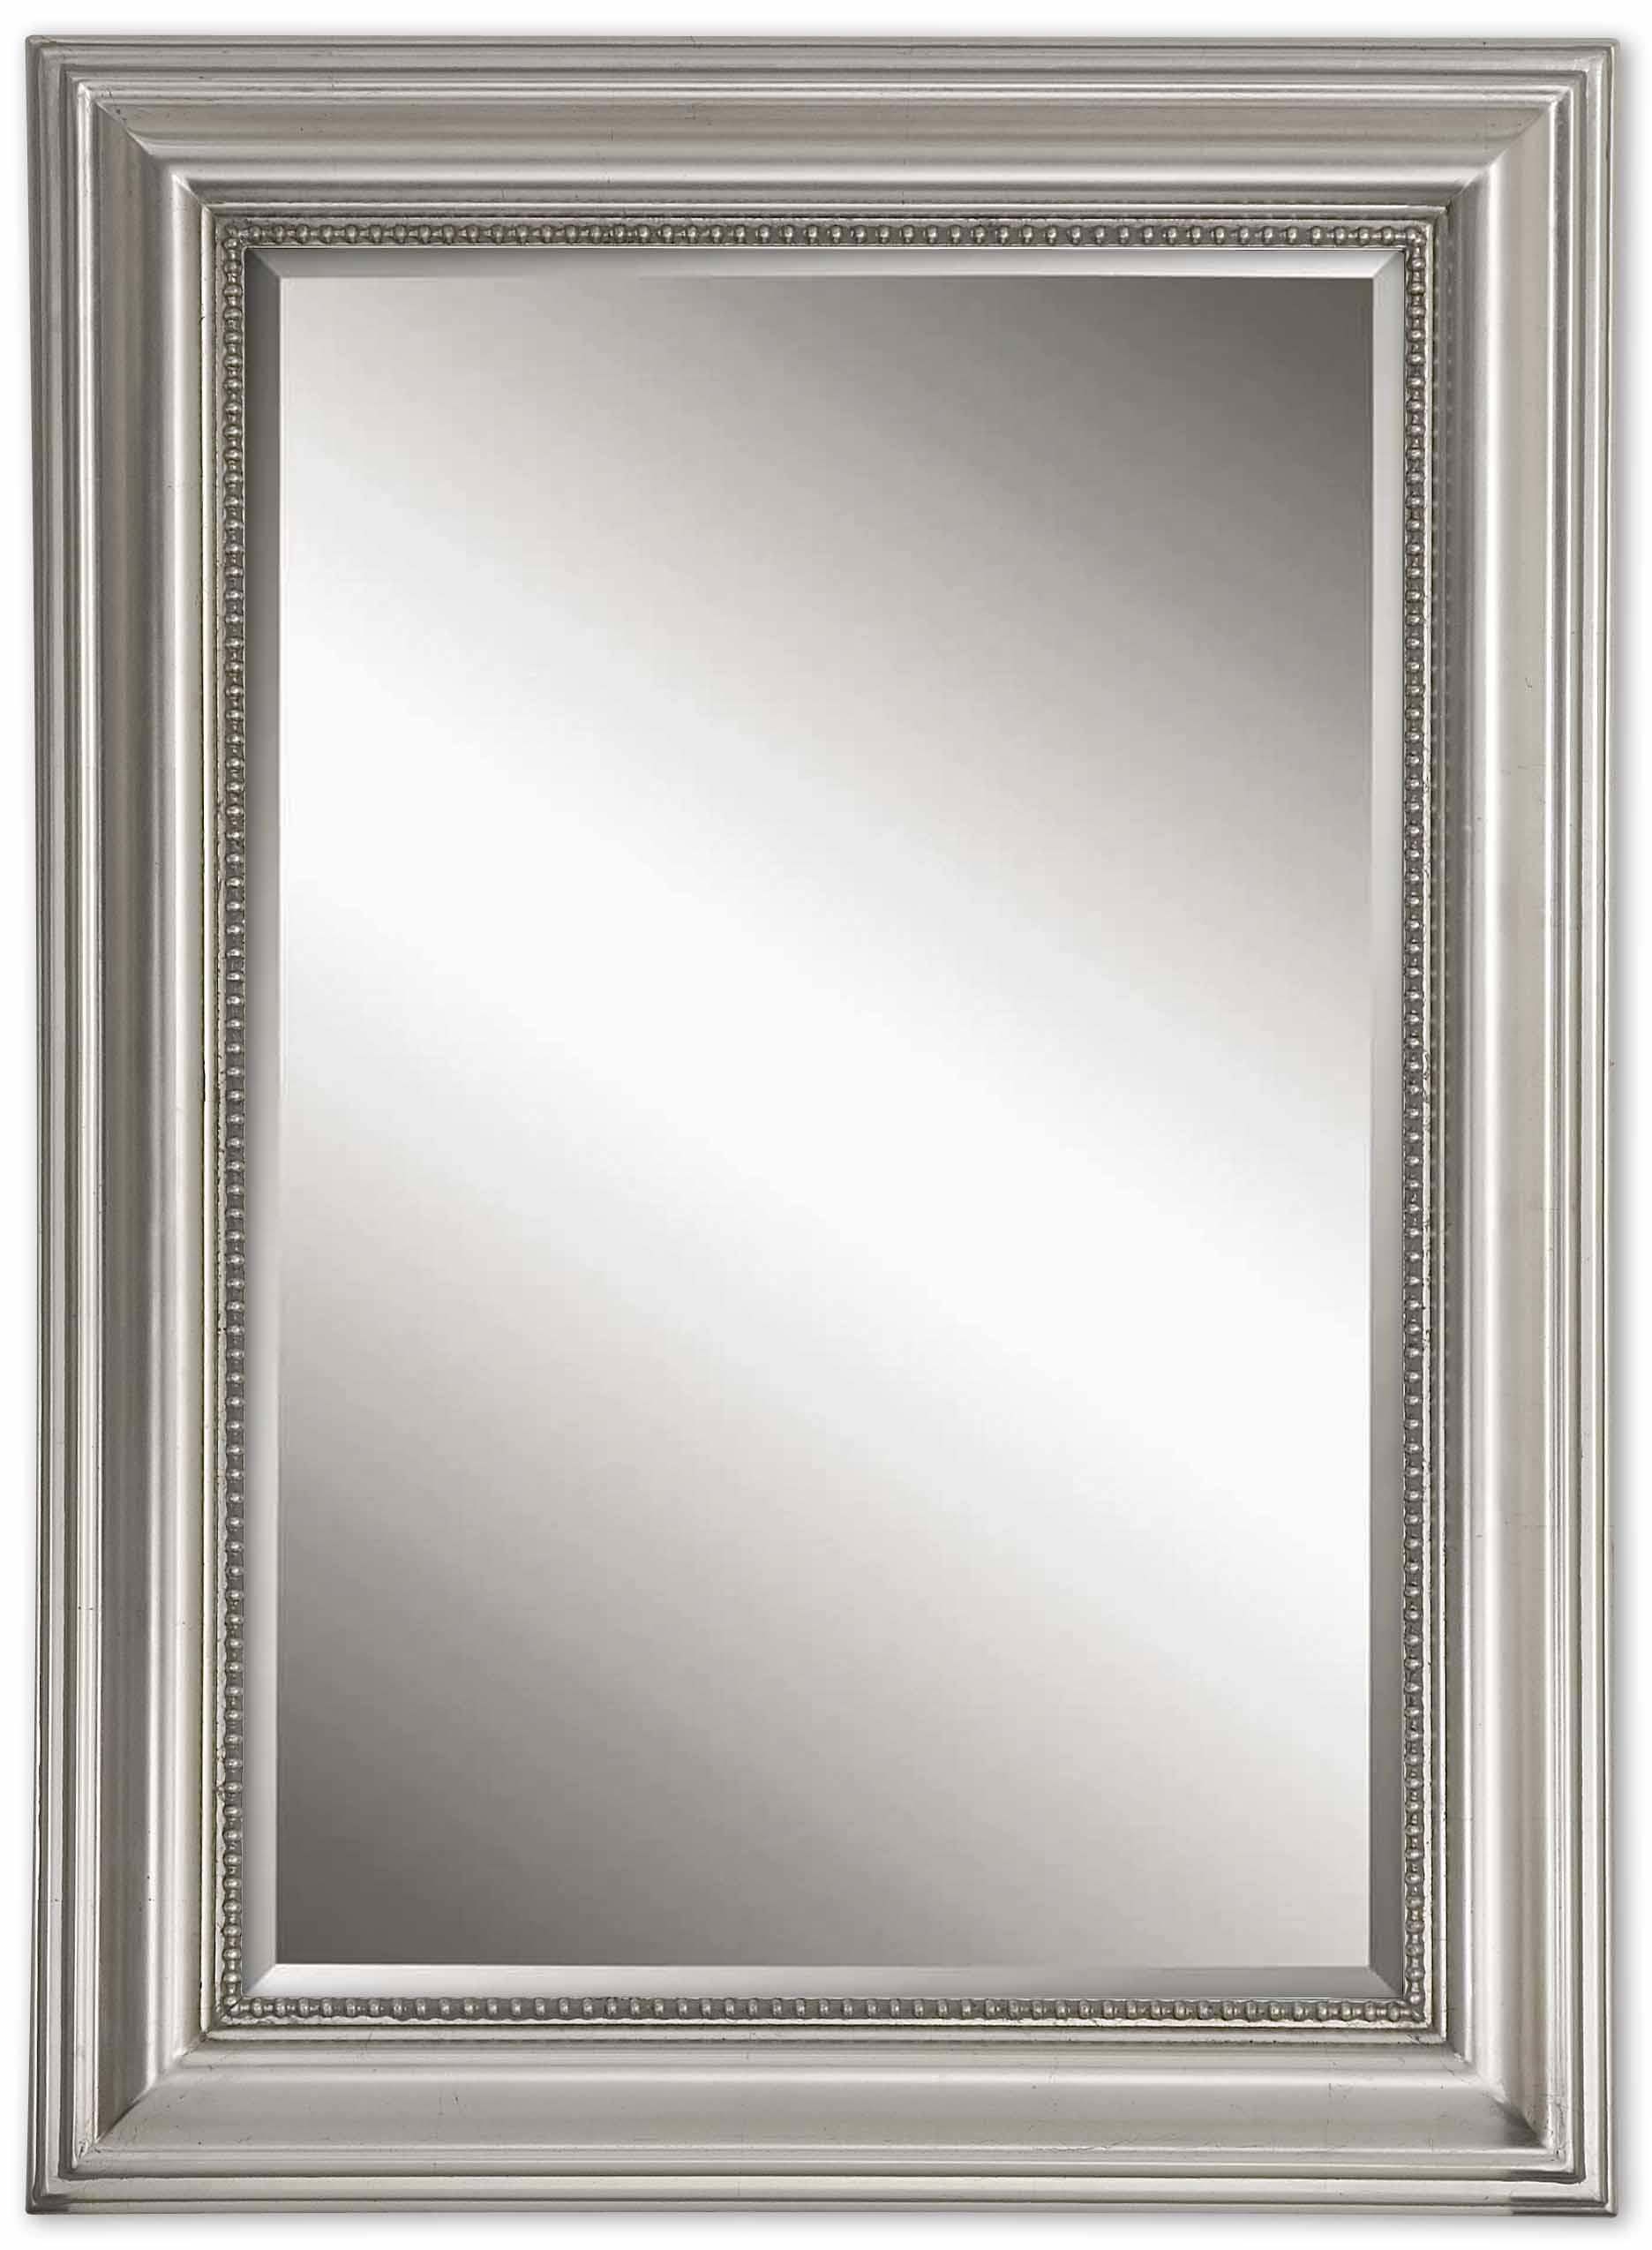 2020 Beaded Wall Mirrors Regarding Stuart Silver Beaded Wall Mirroruttermost – 27″ X 37″ (View 18 of 20)